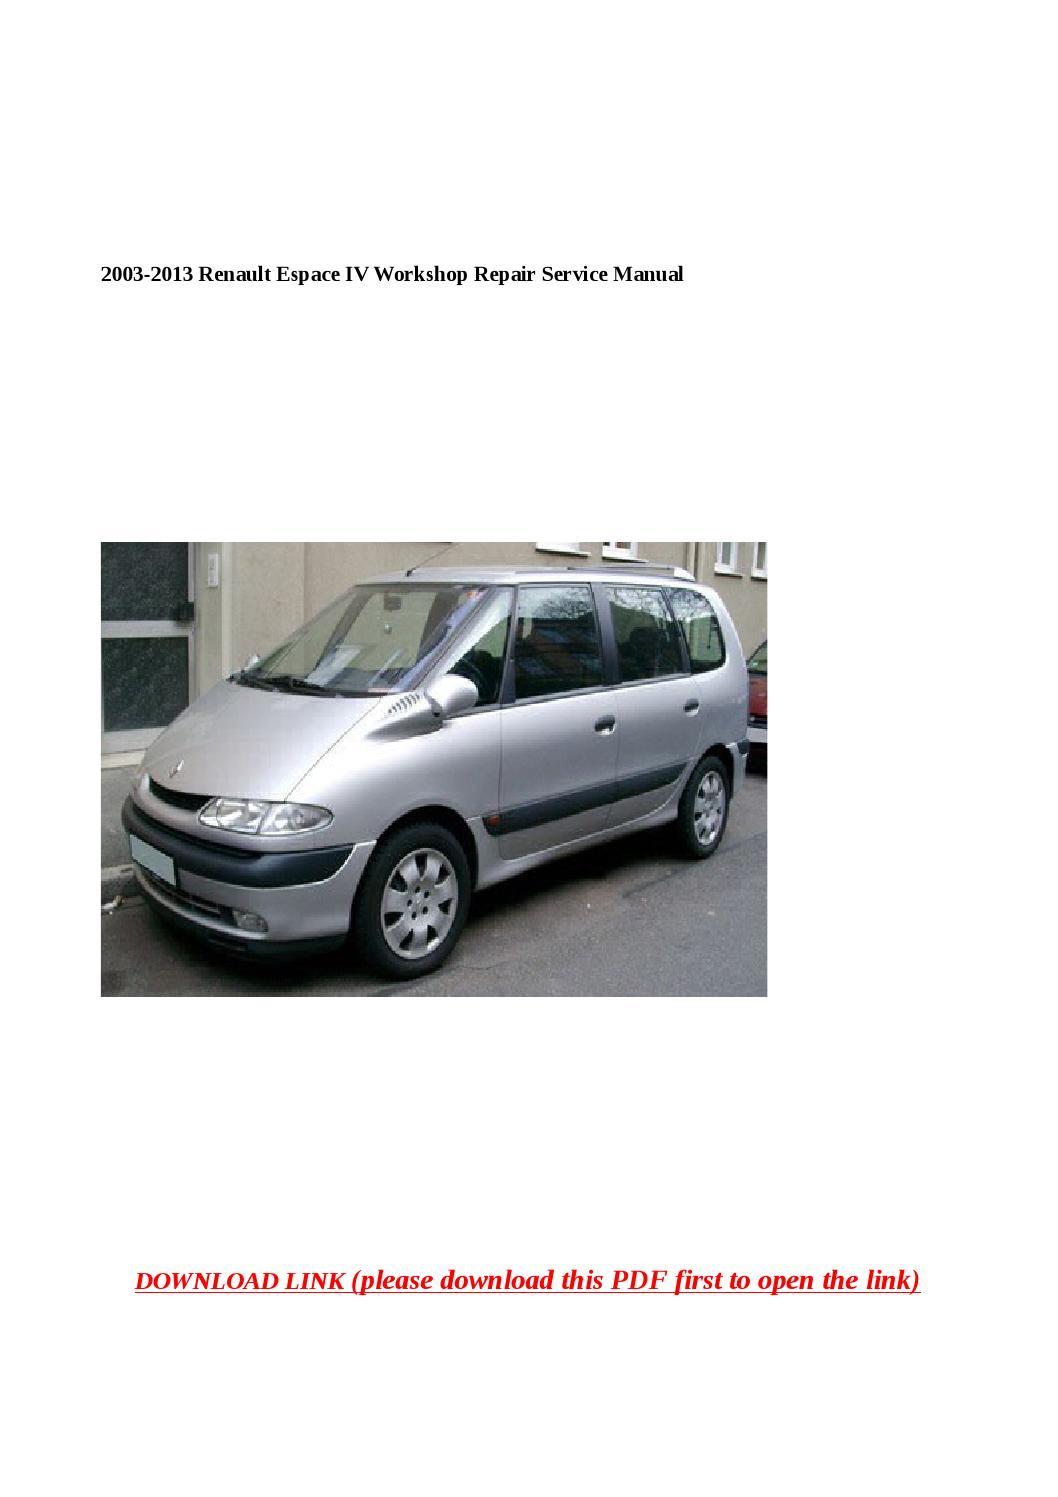 2003 2013 renault espace iv workshop repair service manual by Anna Tang -  issuu